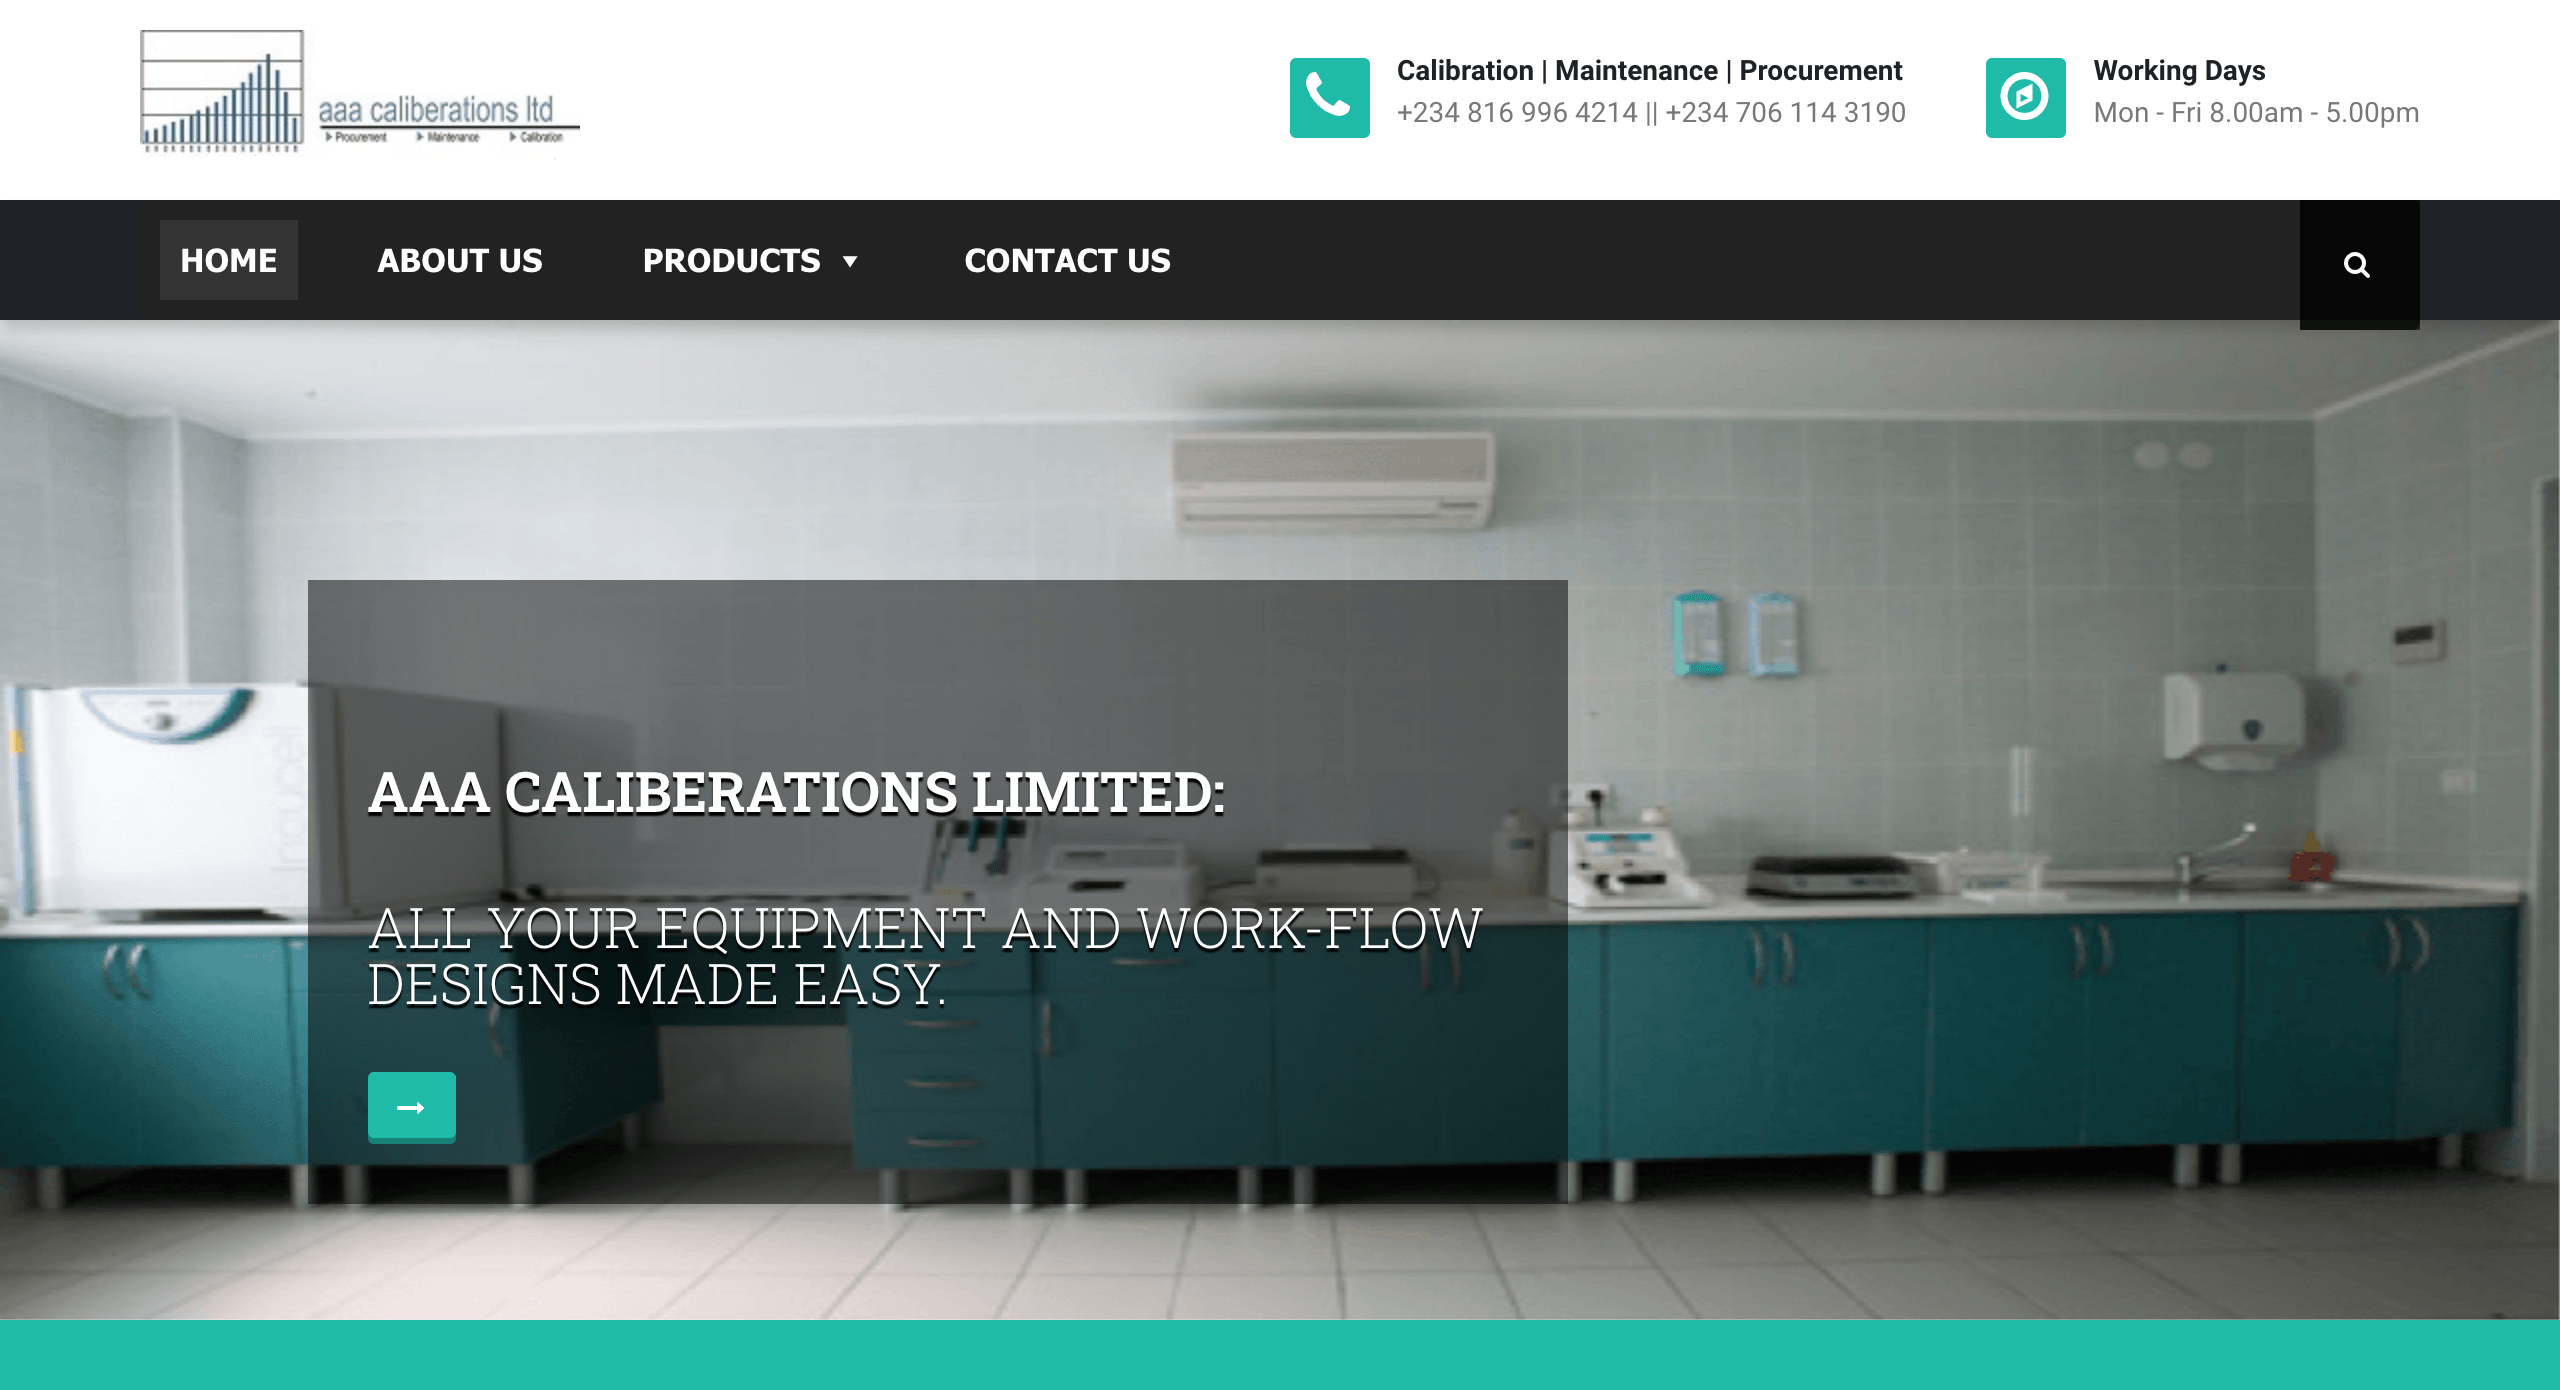 AAA Caliberations Limited